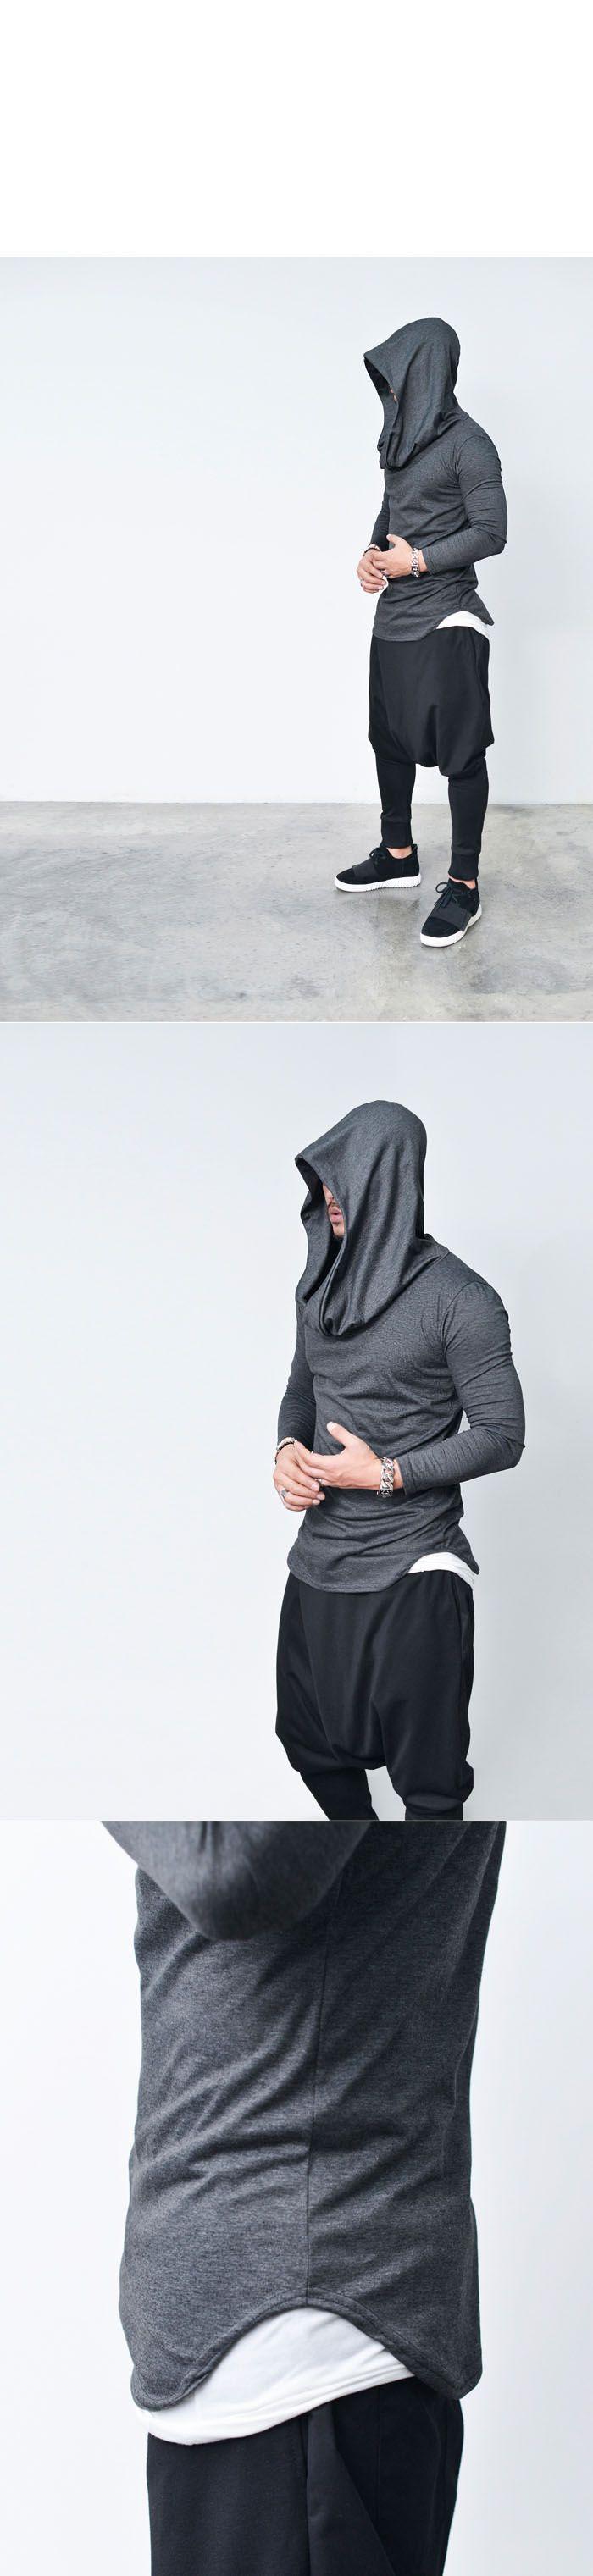 Tops :: Hoodies :: Avant-garde Volume Big Shirring Hood-Tee 607 - Mens Fashion Clothing For An Attractive Guy Look